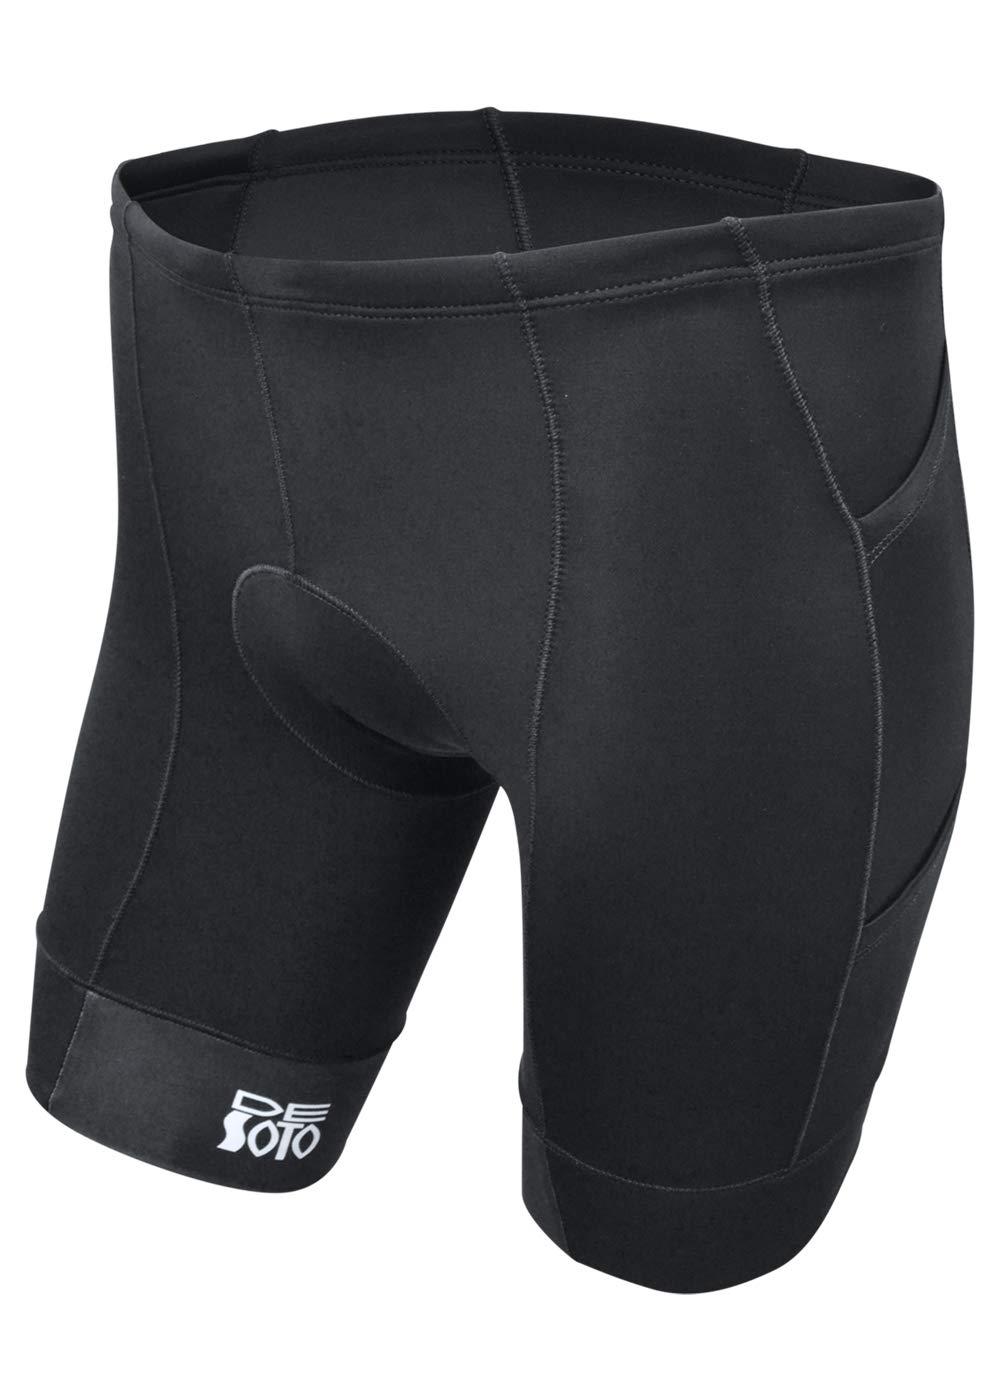 De Soto Mobius Tri Short 4-Pocket (Black, Medium)